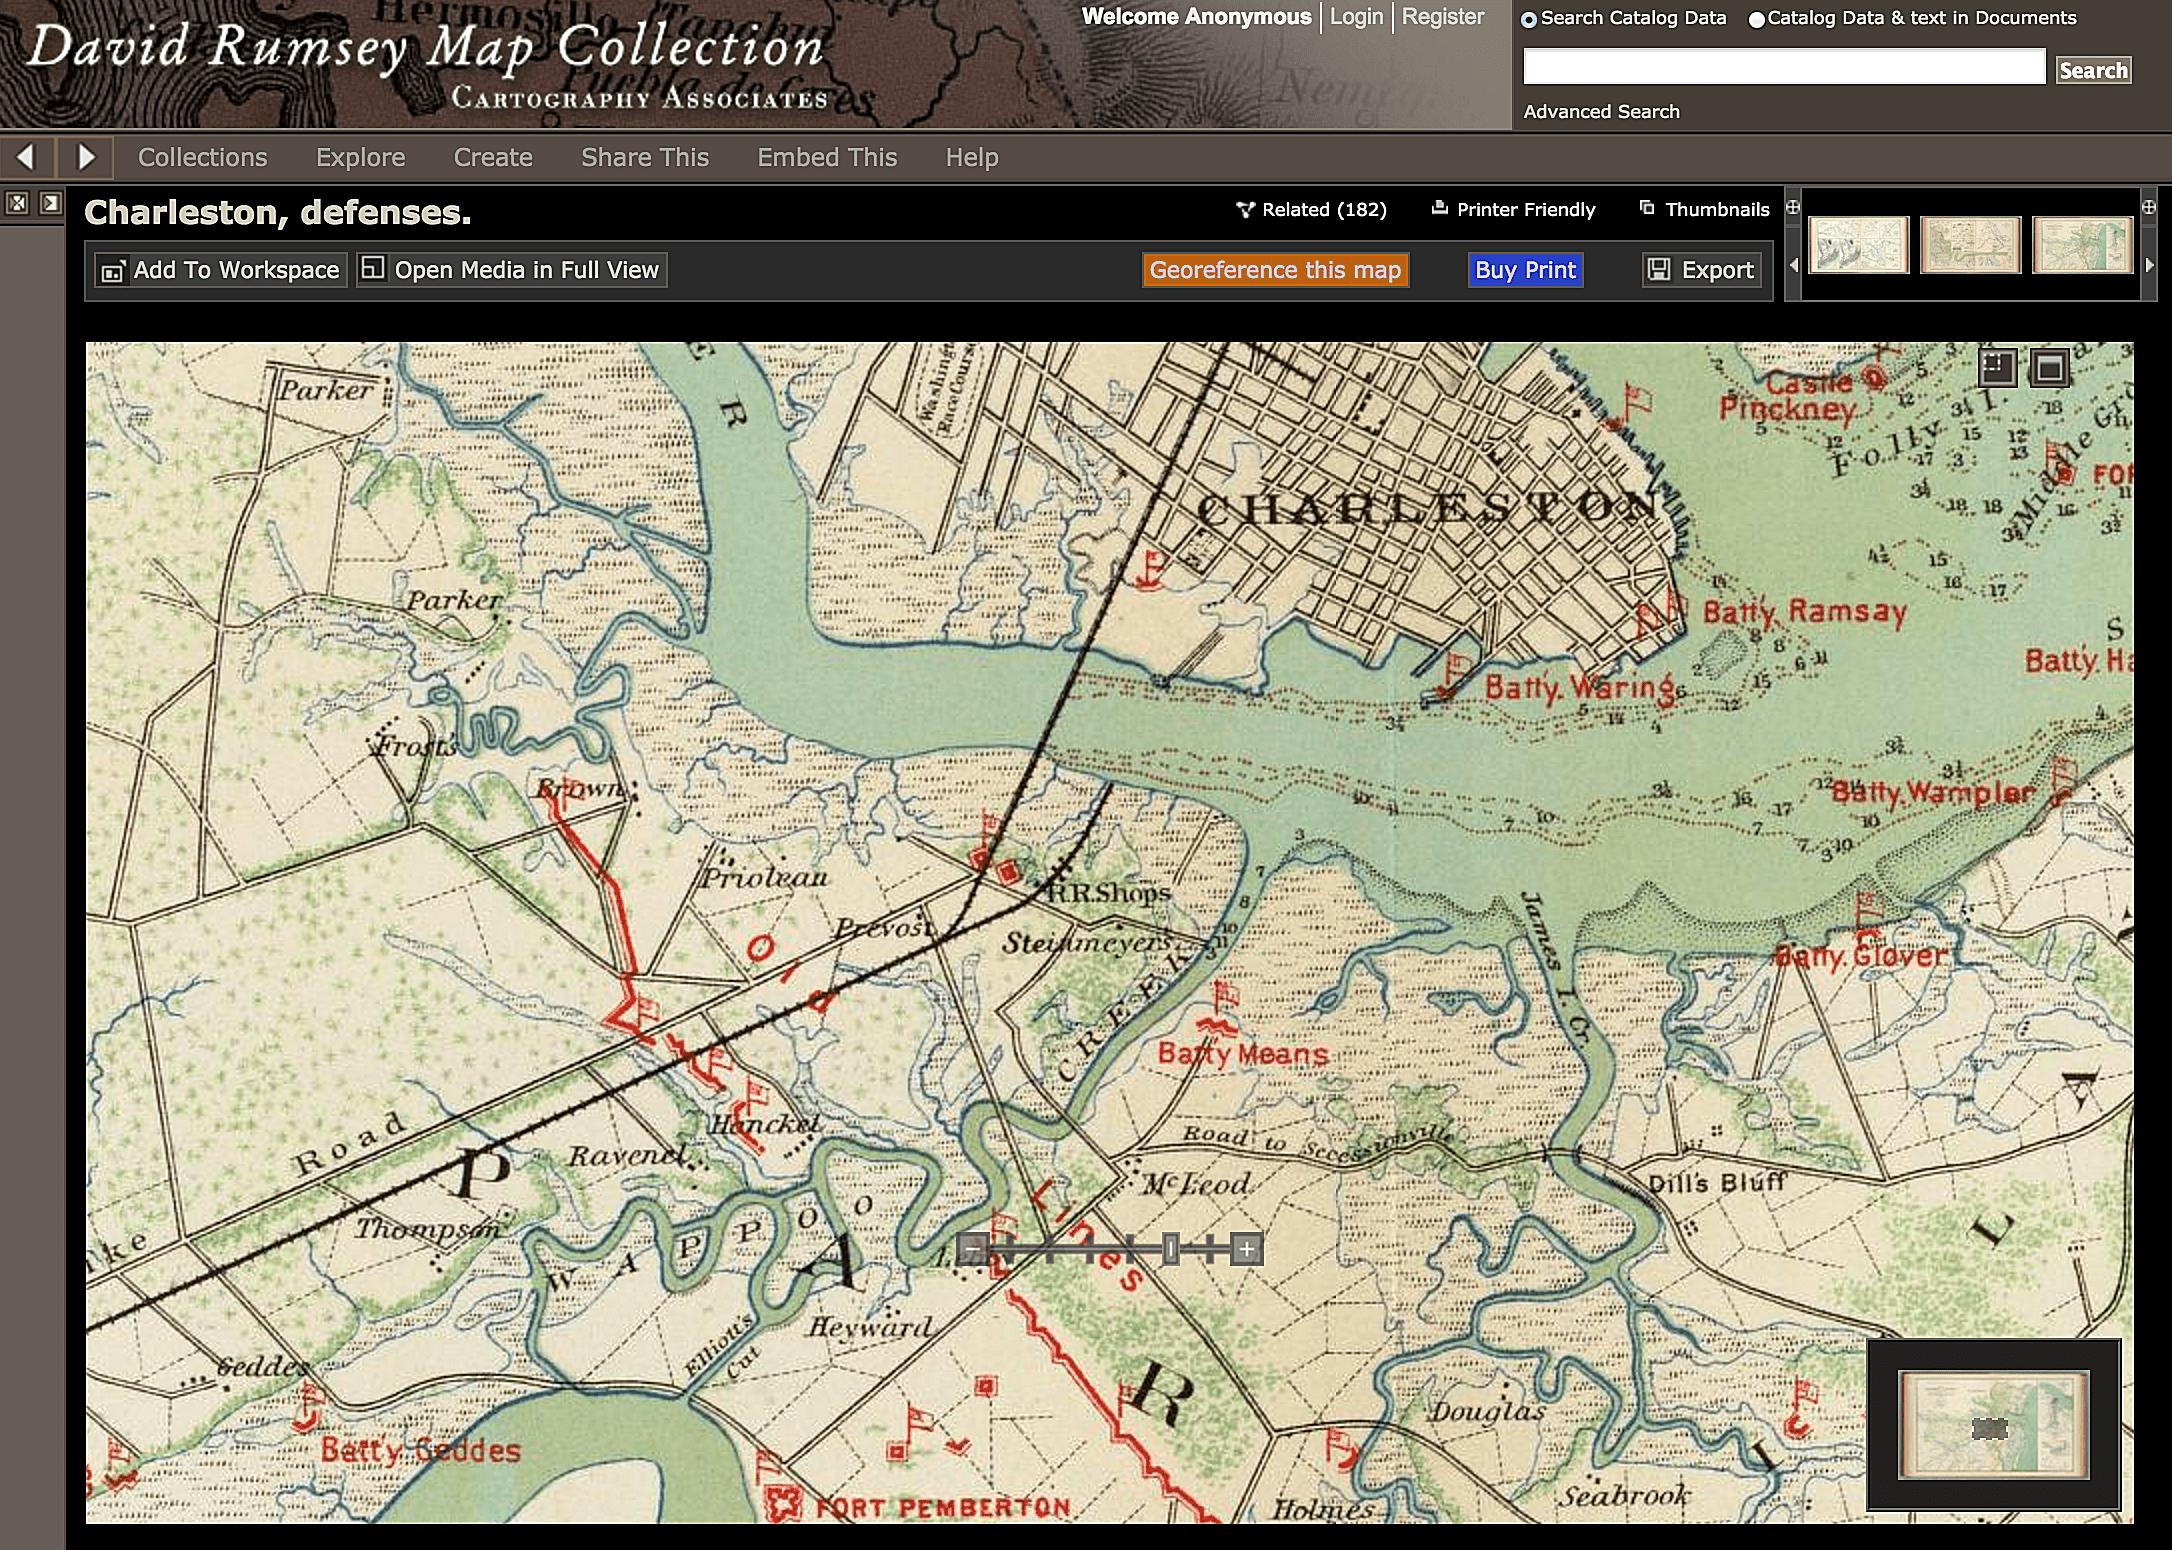 Civil war defenses at Charleston harbor in South Carolina. David Rumsey Map Collection.